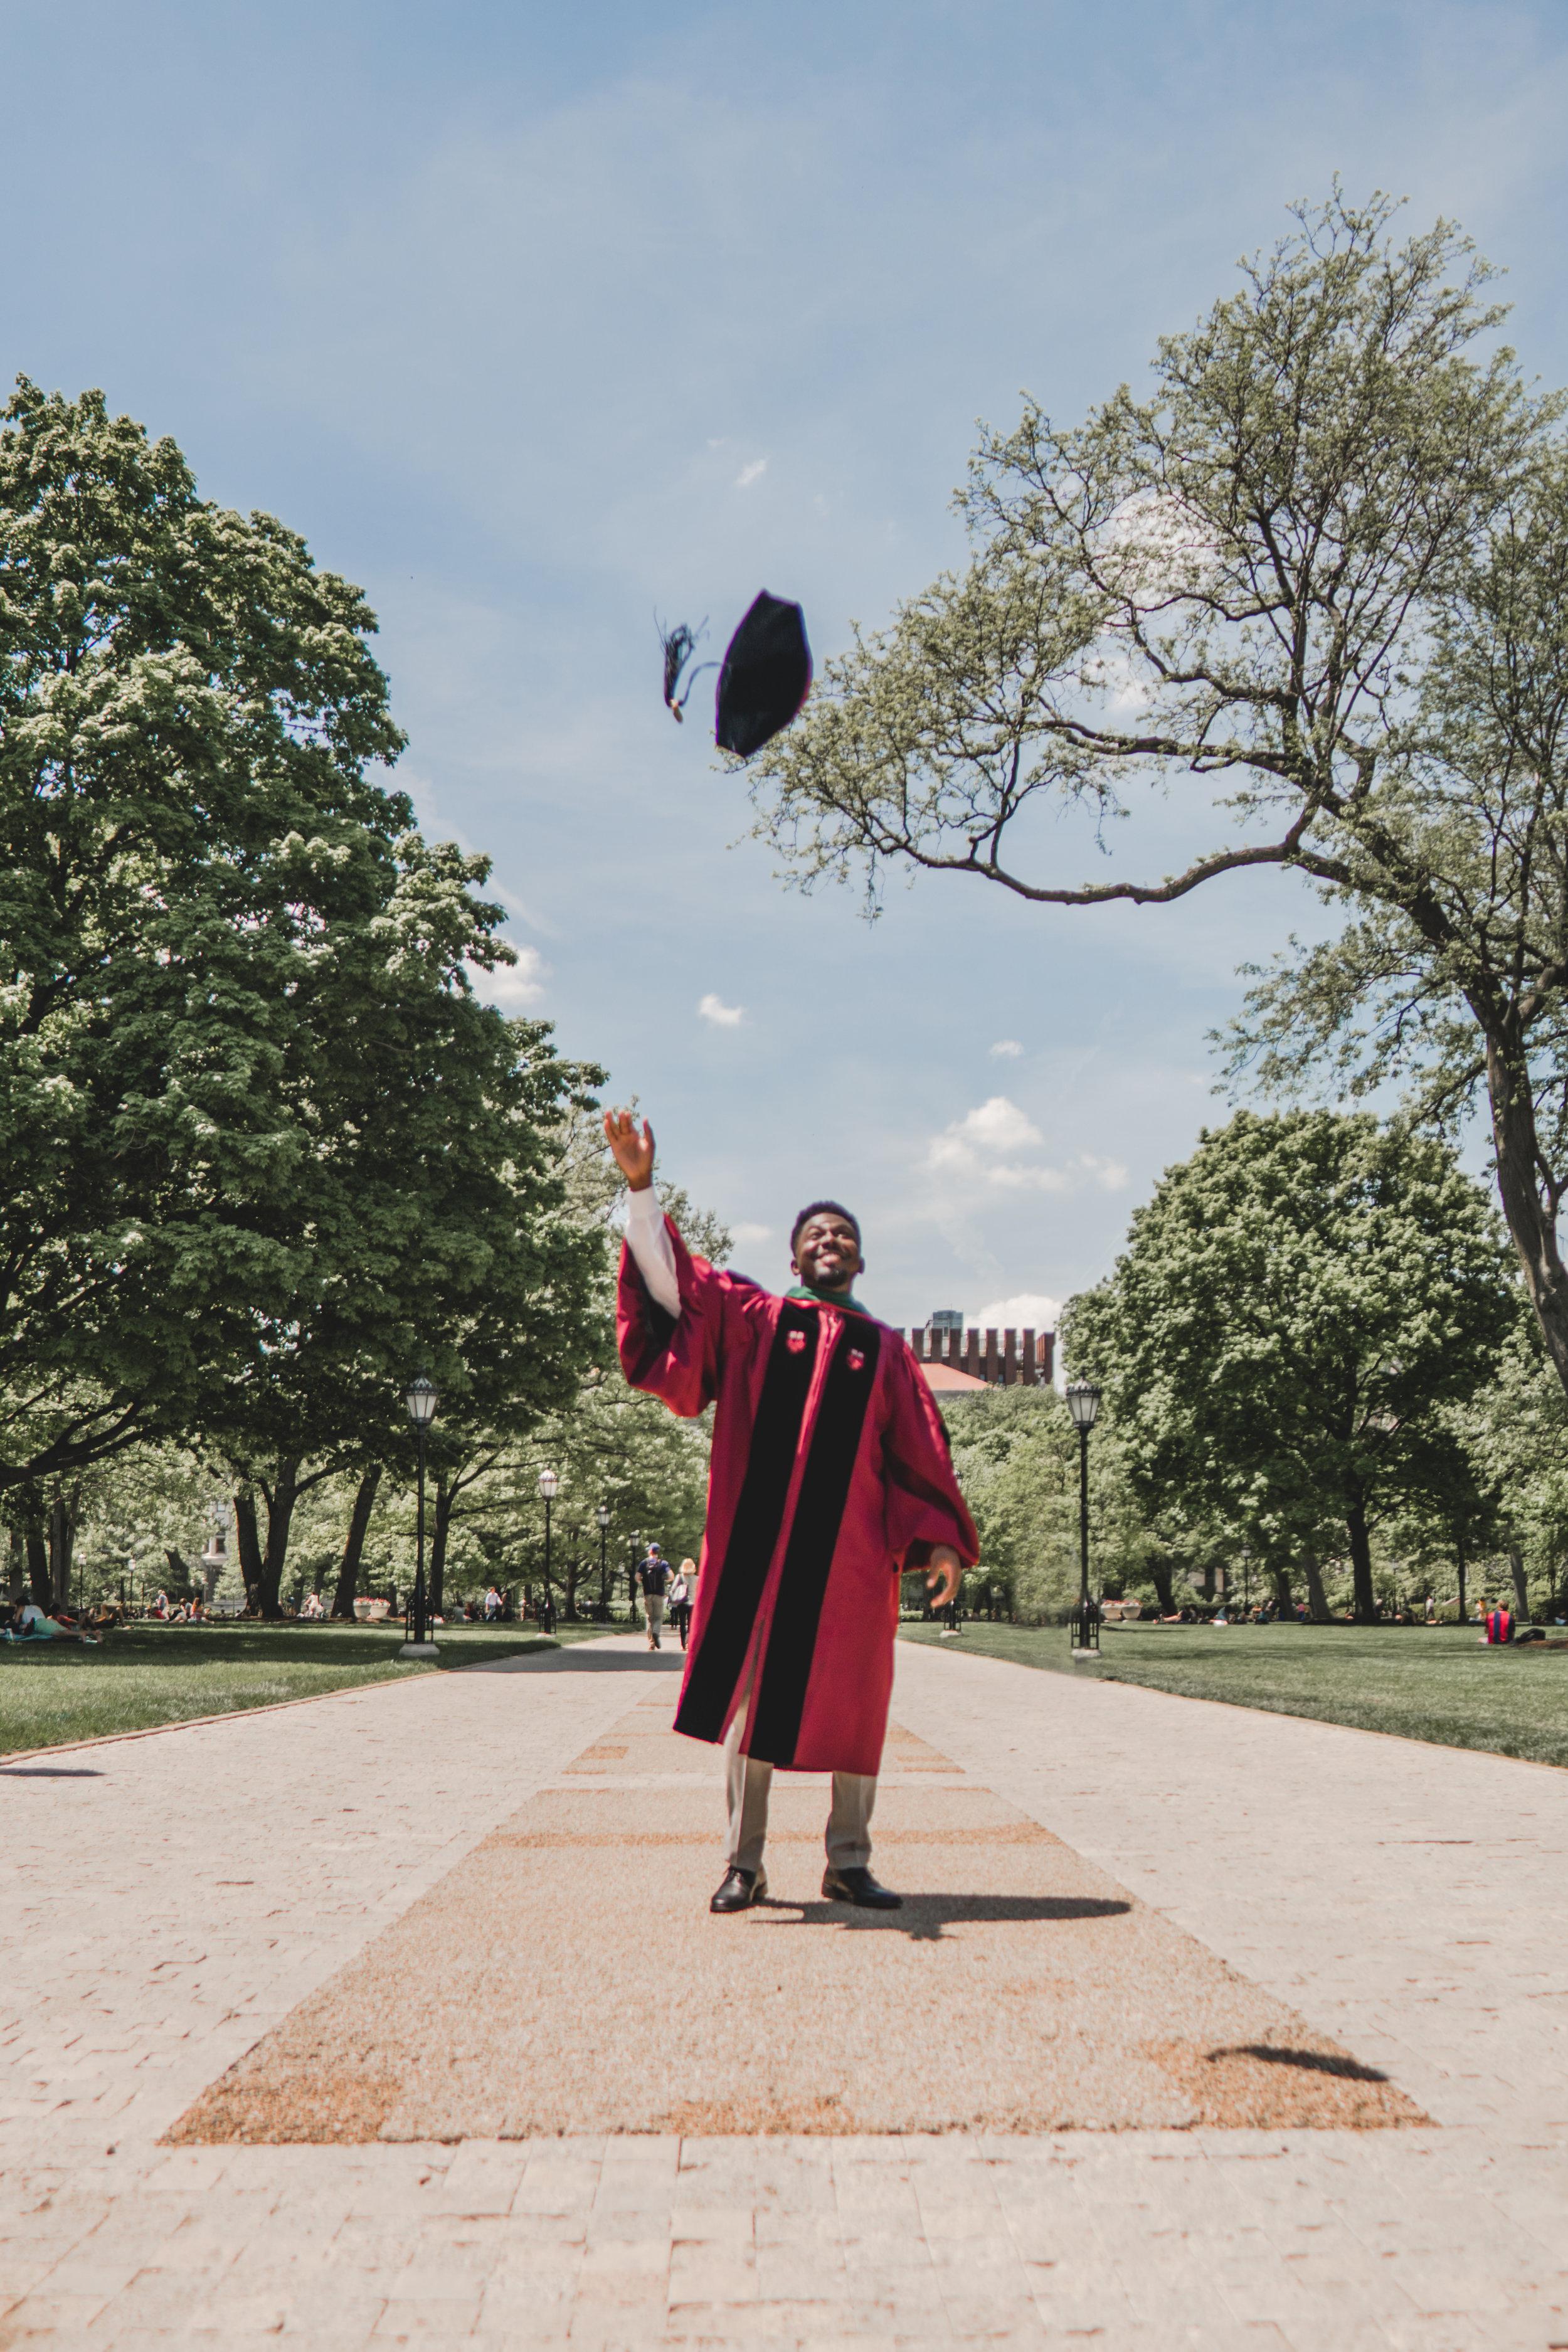 Jordan Green Graduation 5.25.18 - Datflipmel Photo & Films-18.jpg